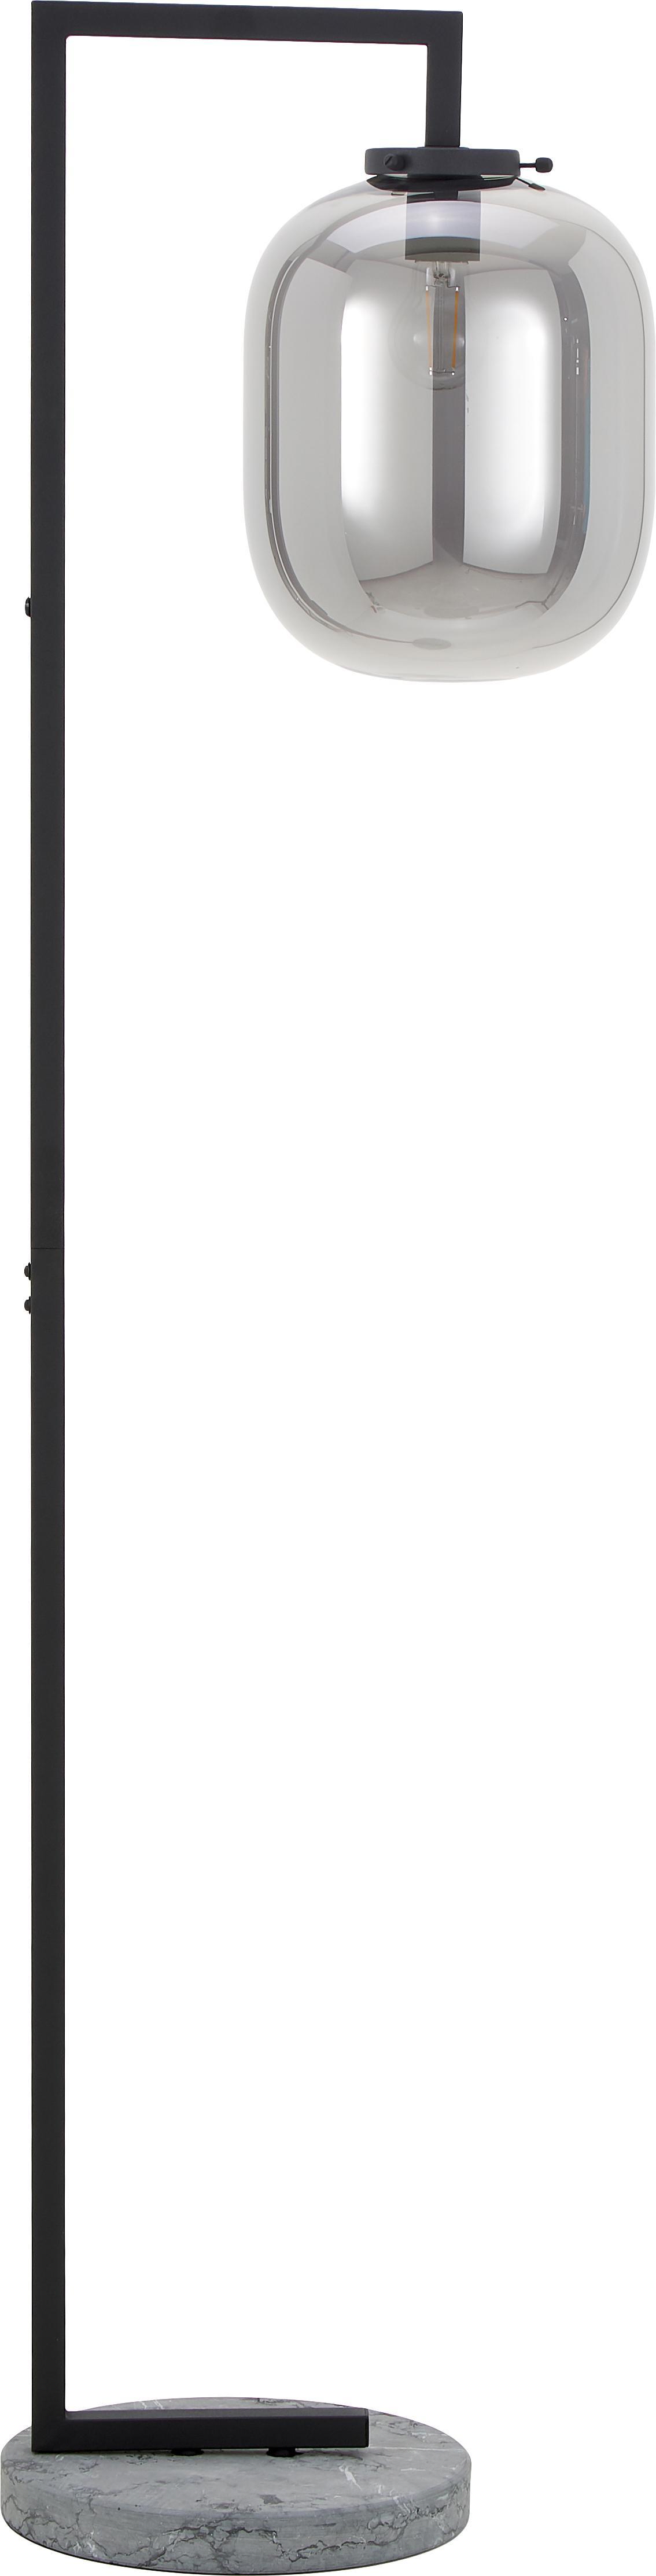 Vloerlamp Leola van glas, Lampenkap: glas, Lampvoet: marmer, Chroomkleurig, zwart, Ø 12 x H 165 cm